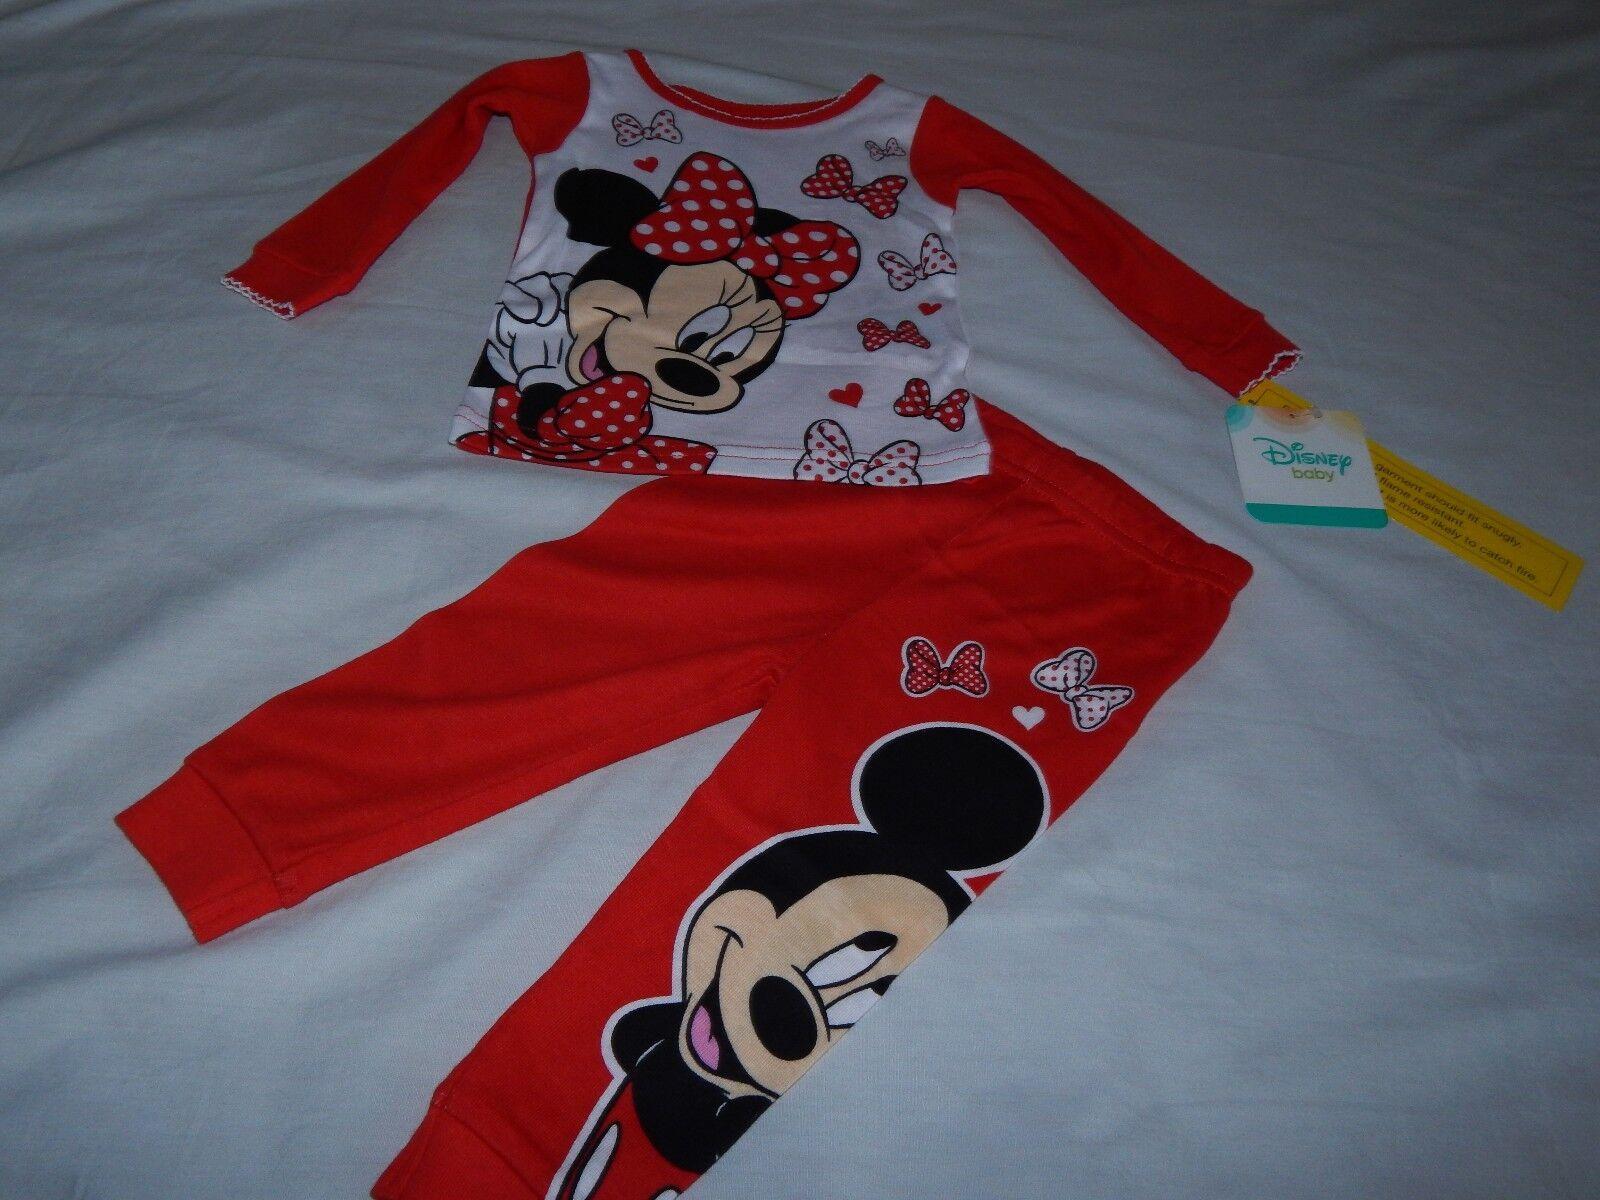 Disney Baby Minnie Mouse Pyjamas My Little Dreamer 6-9 9-12 12-18 18-24 Months